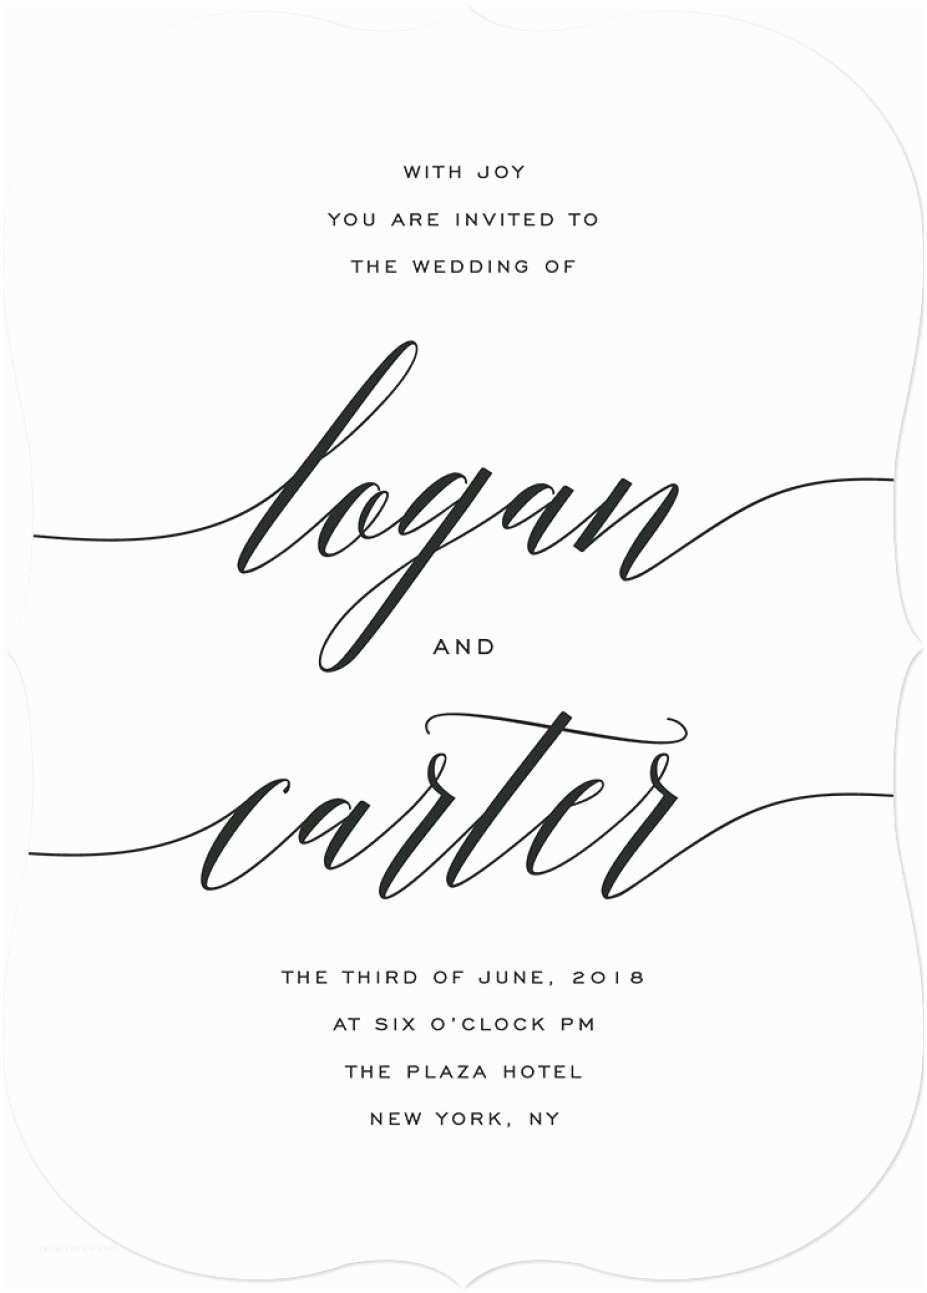 Correct Wording for Wedding Invitations Proper Wording for Wedding Invitations Image Collections